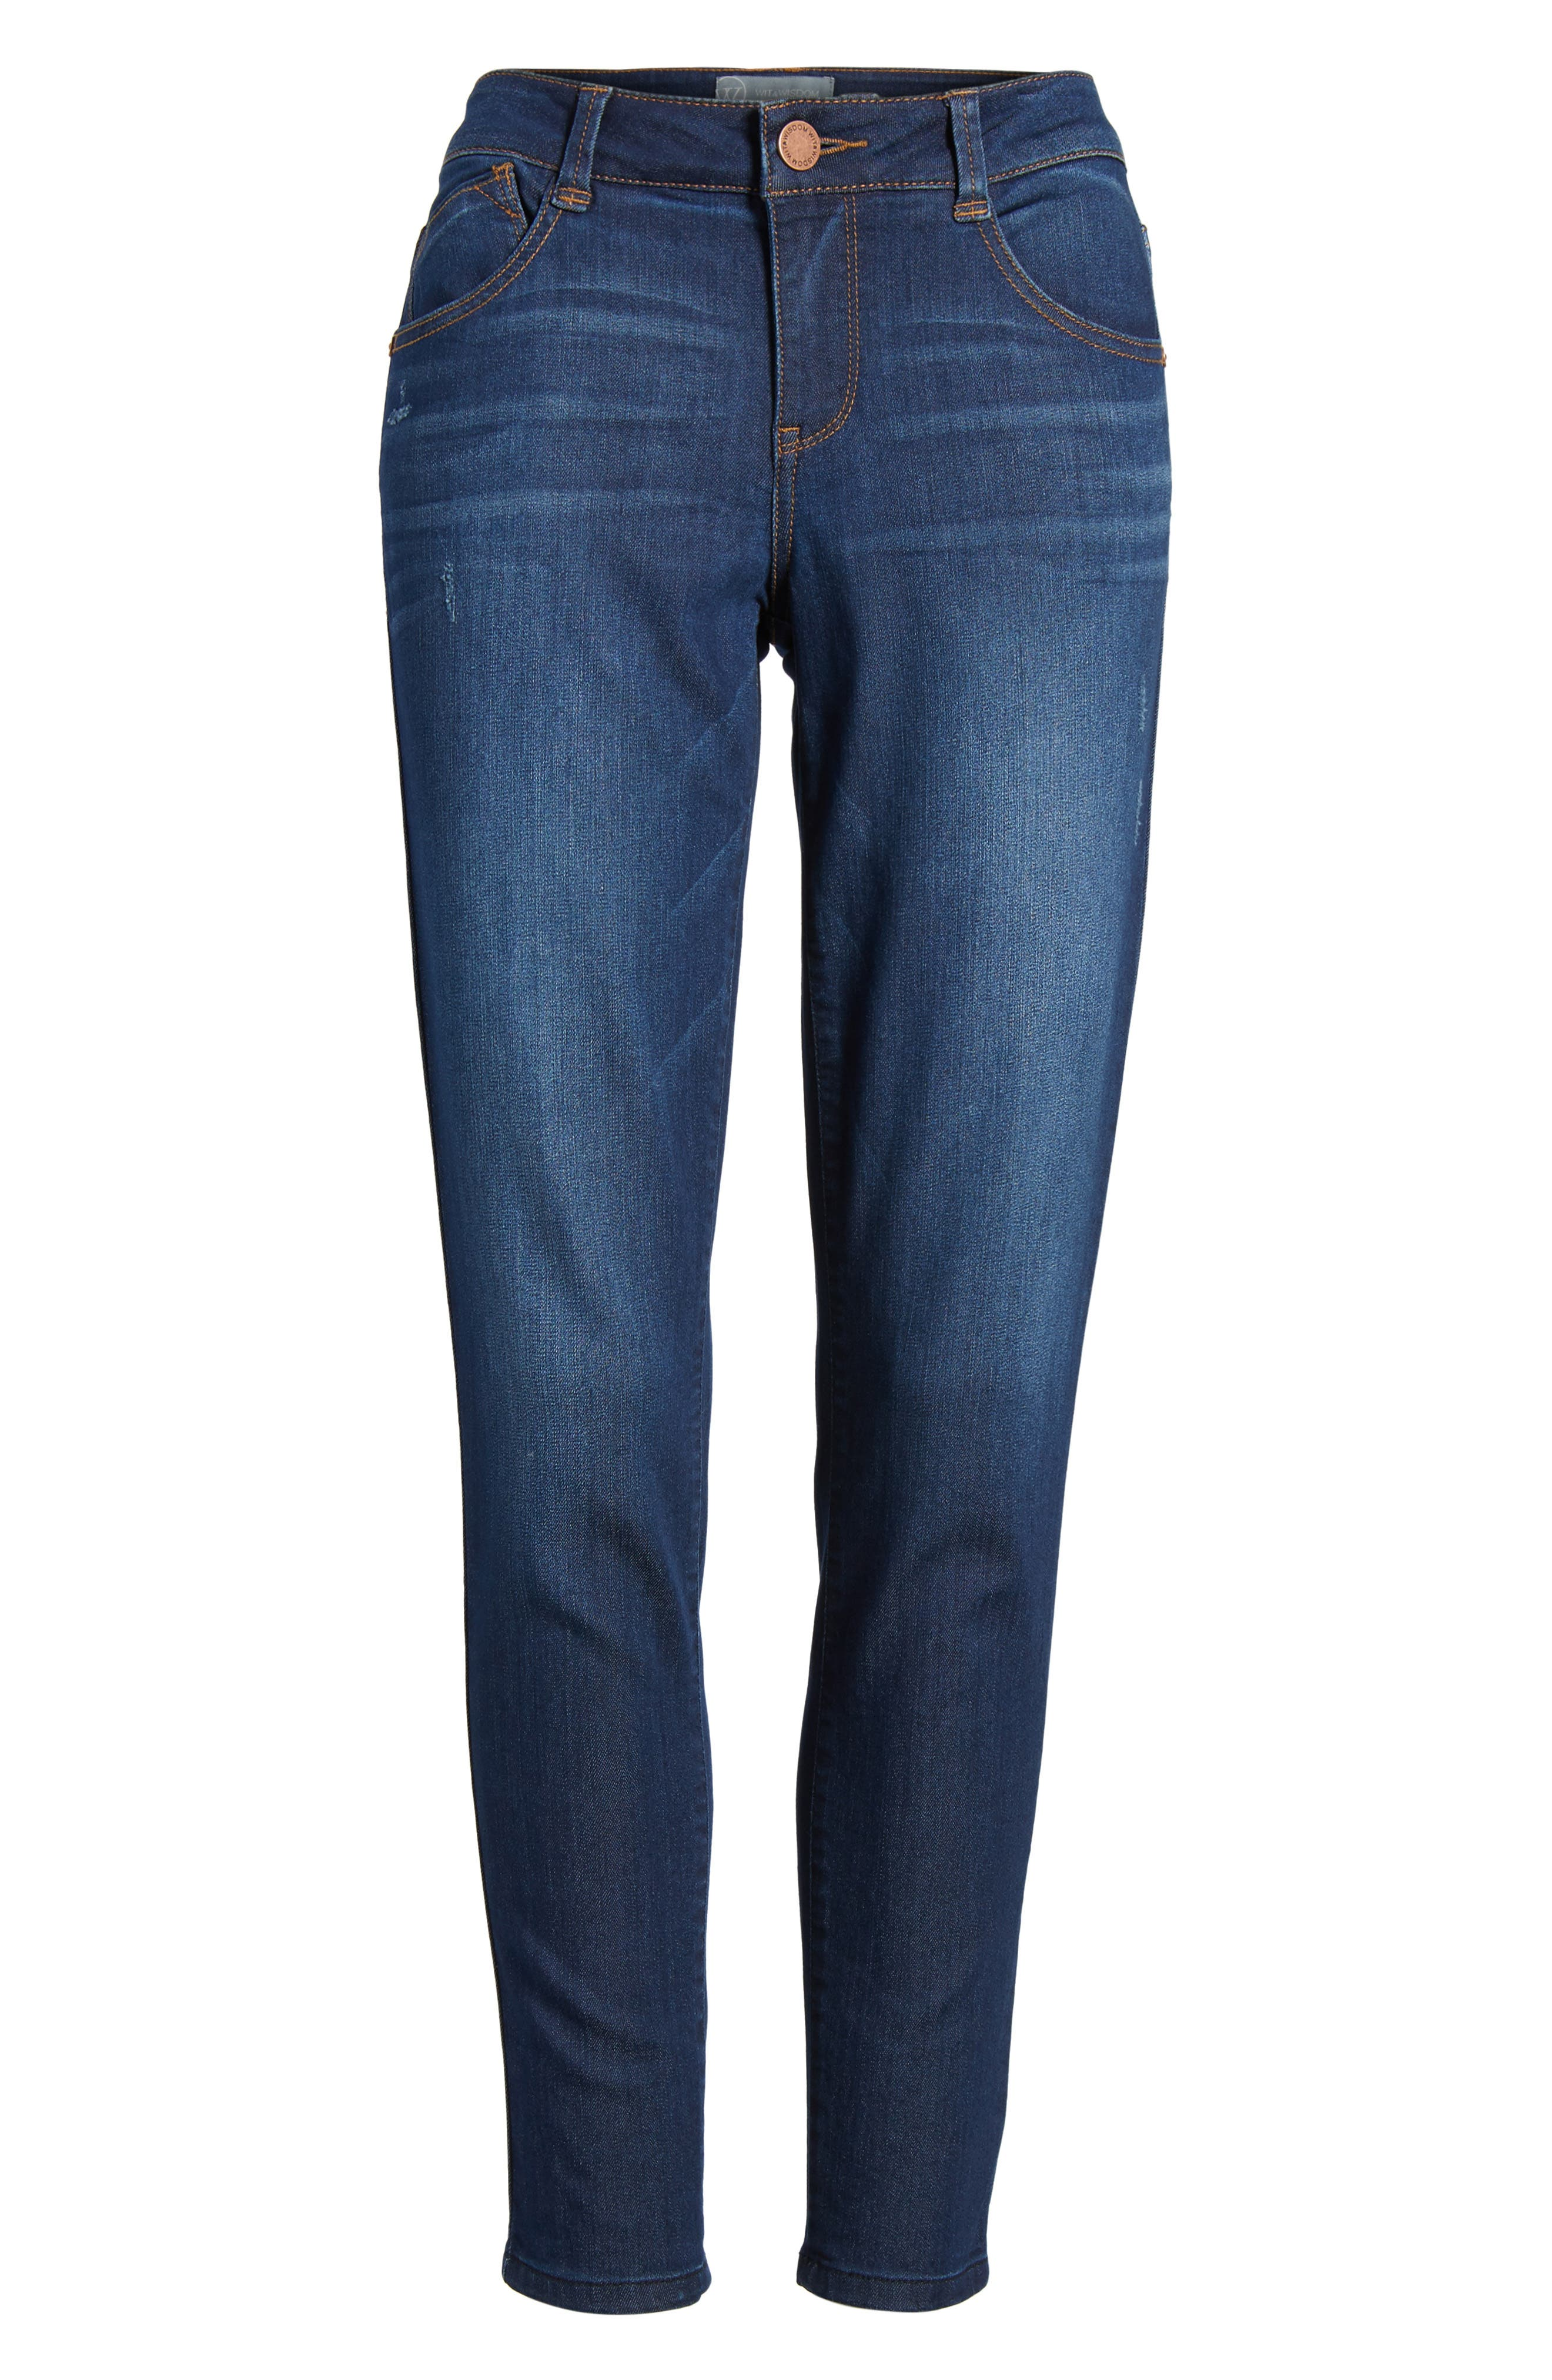 Skinny Ankle Jeans,                             Alternate thumbnail 6, color,